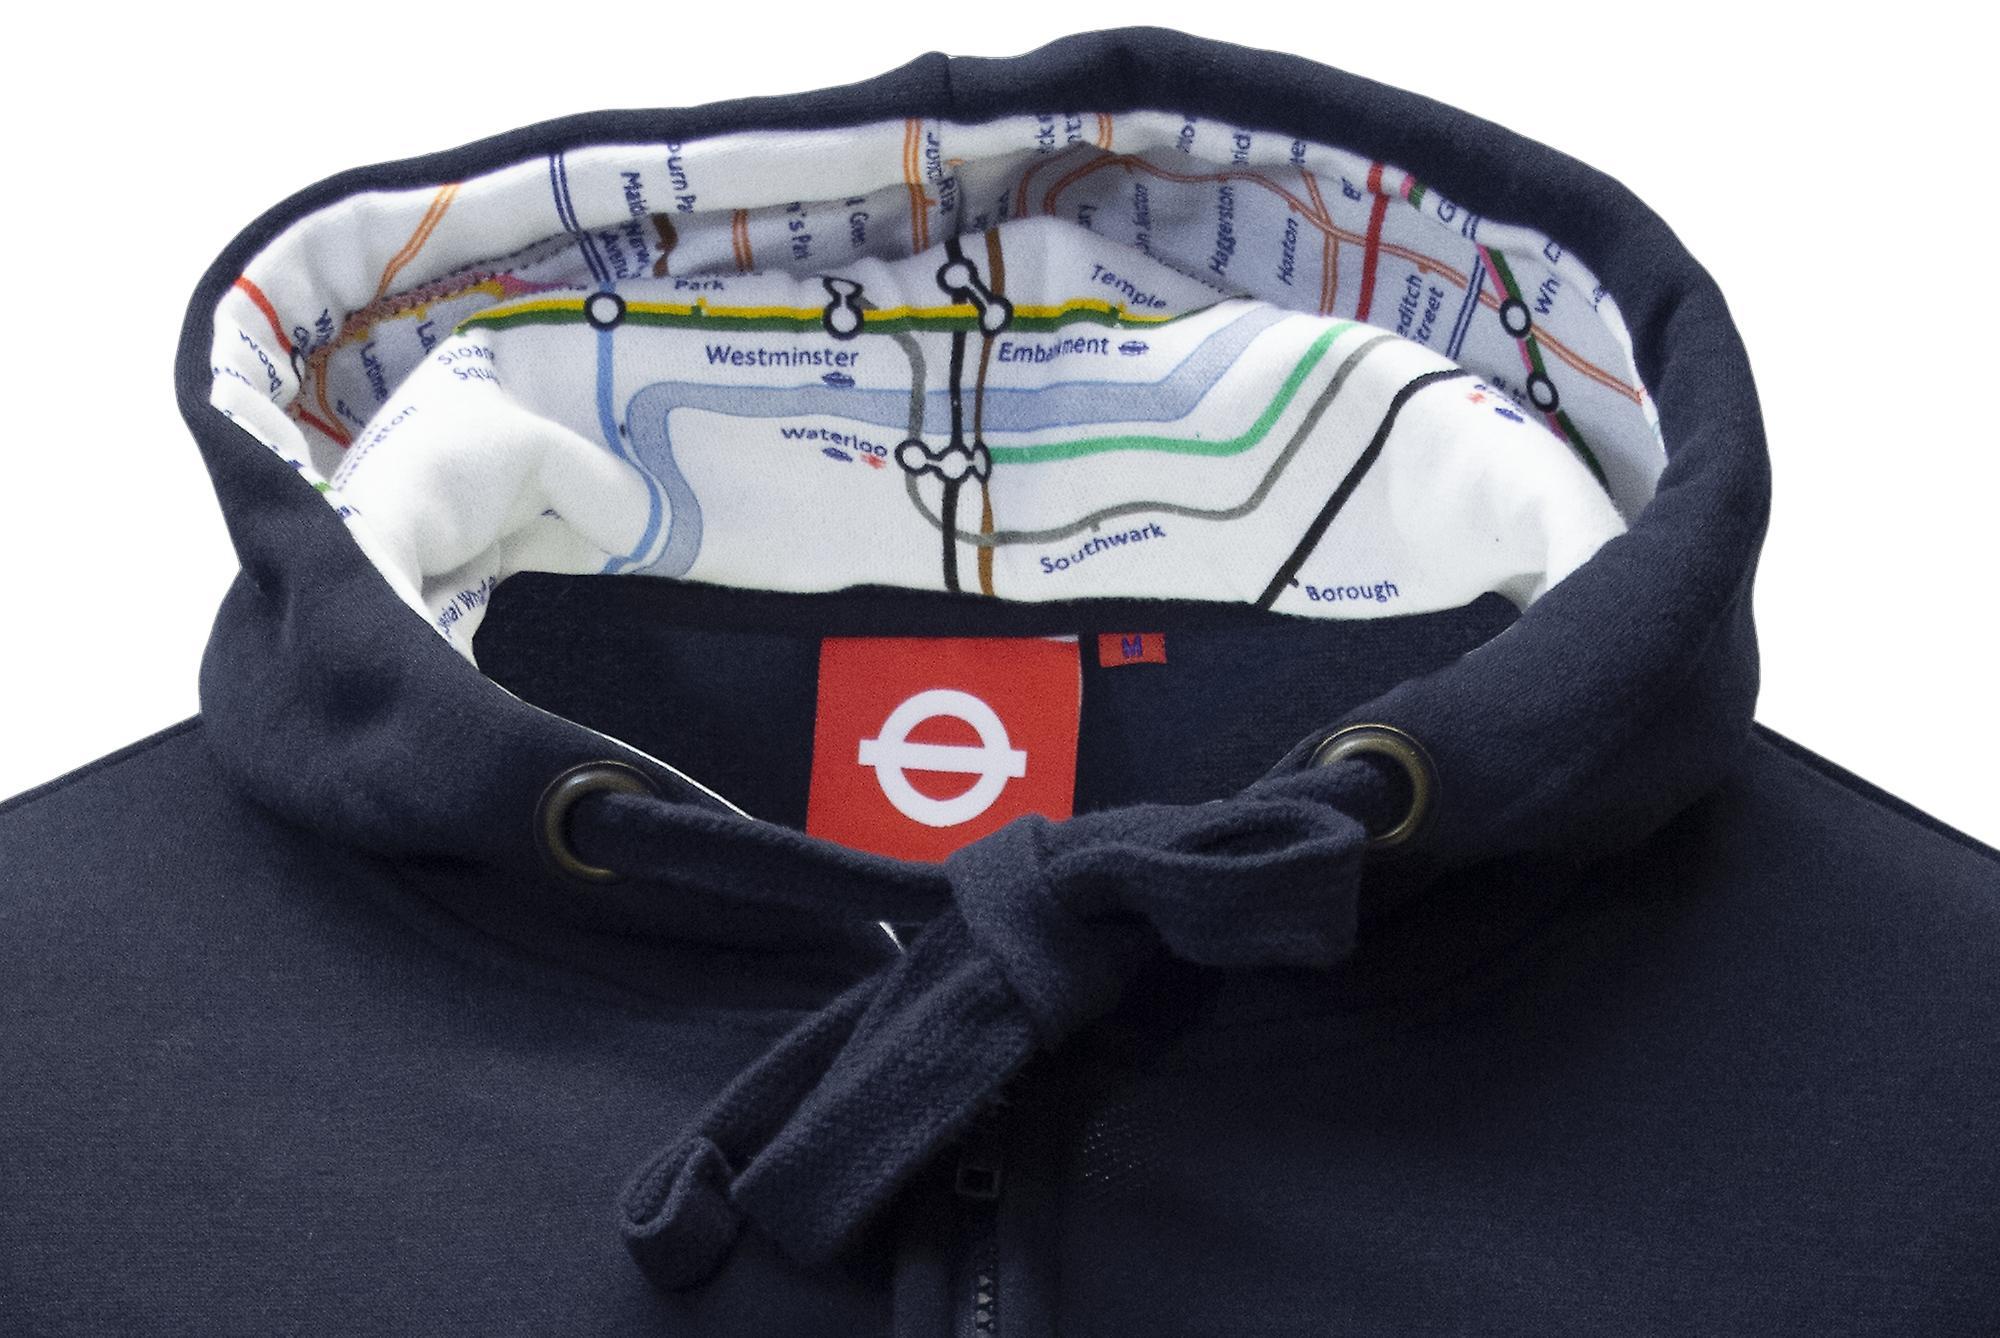 Tfl™129z licensed unisex london roundel™ zipped hooded sweatshirt navy